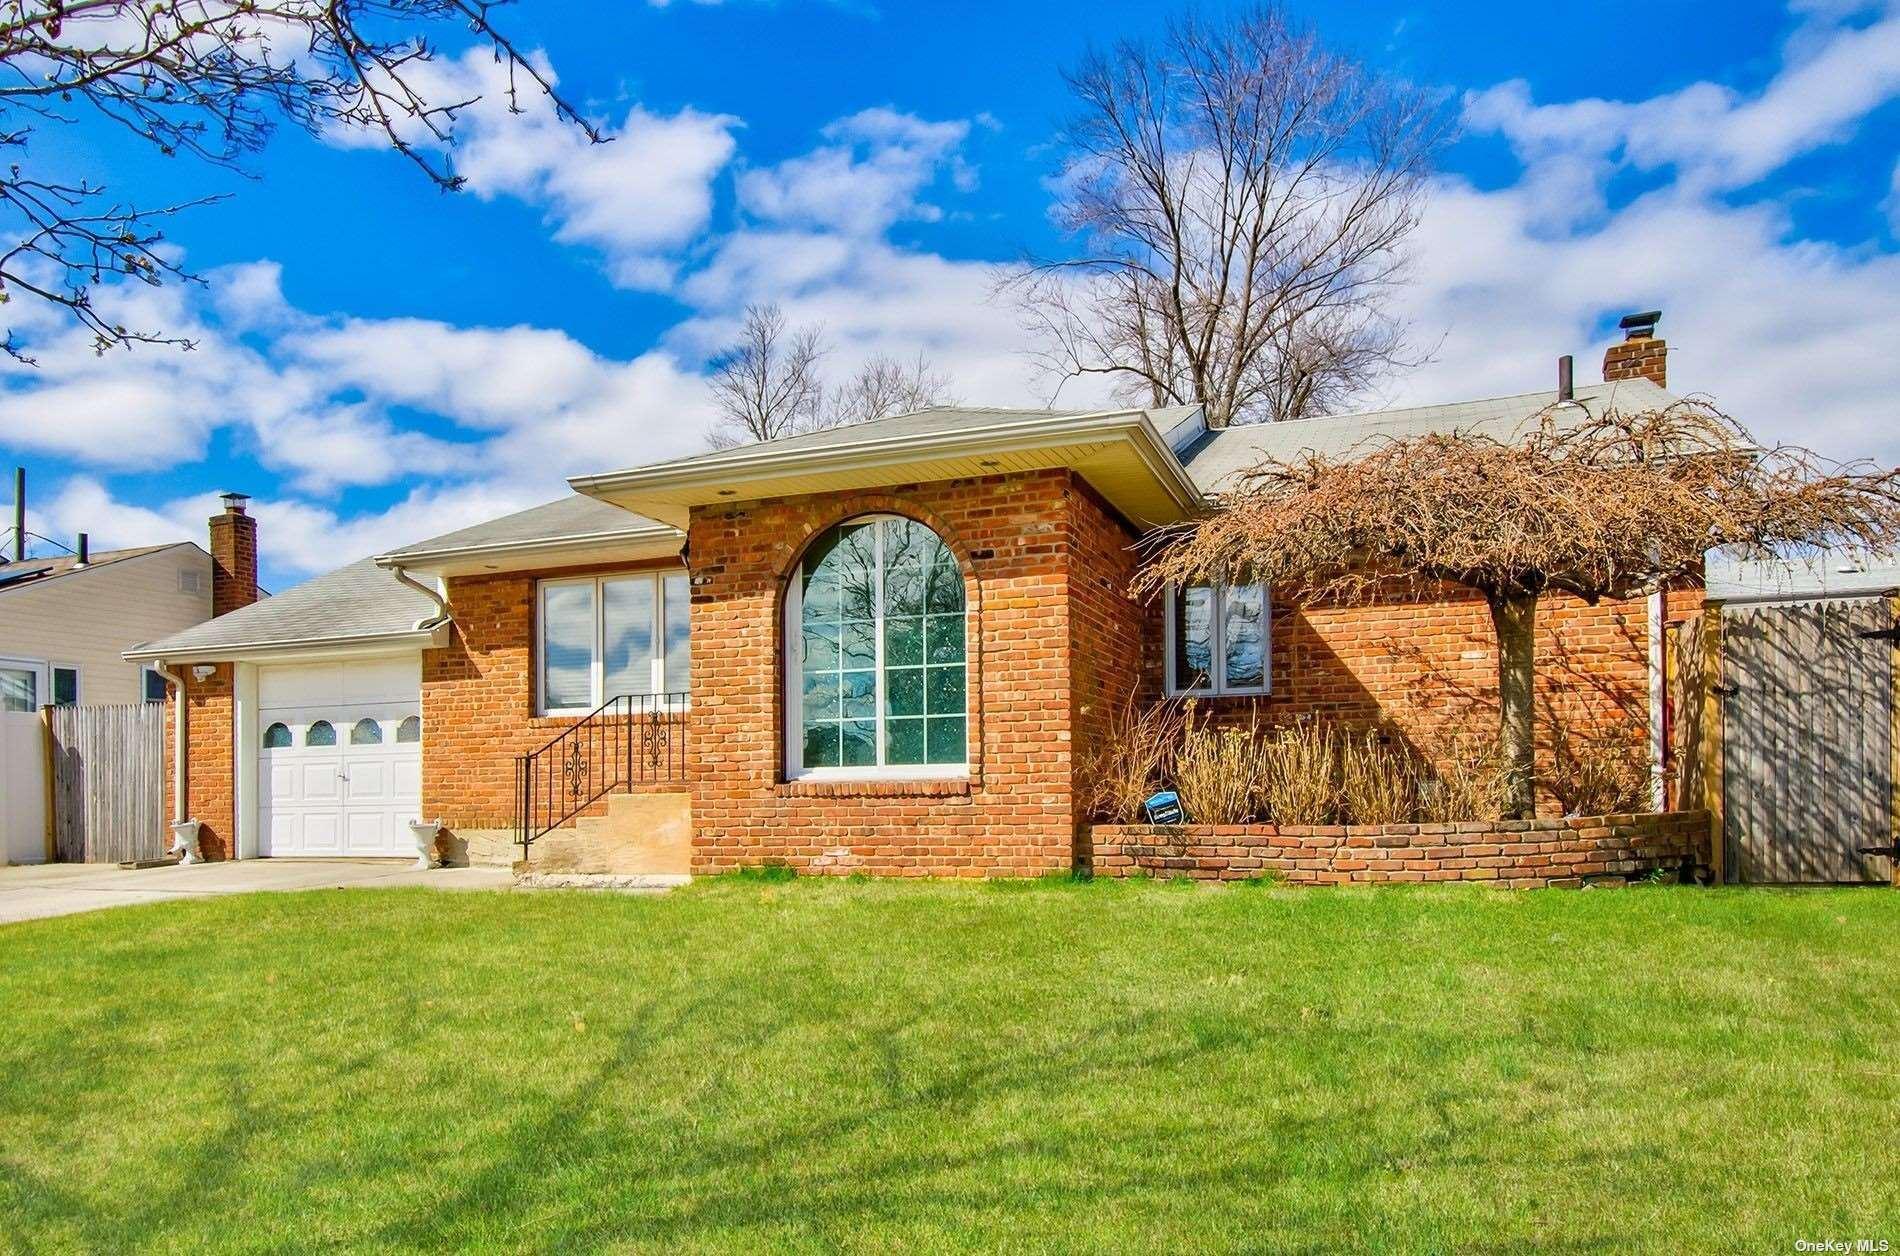 4 Frances Lane, Hicksville, NY 11801 - MLS#: 3301115